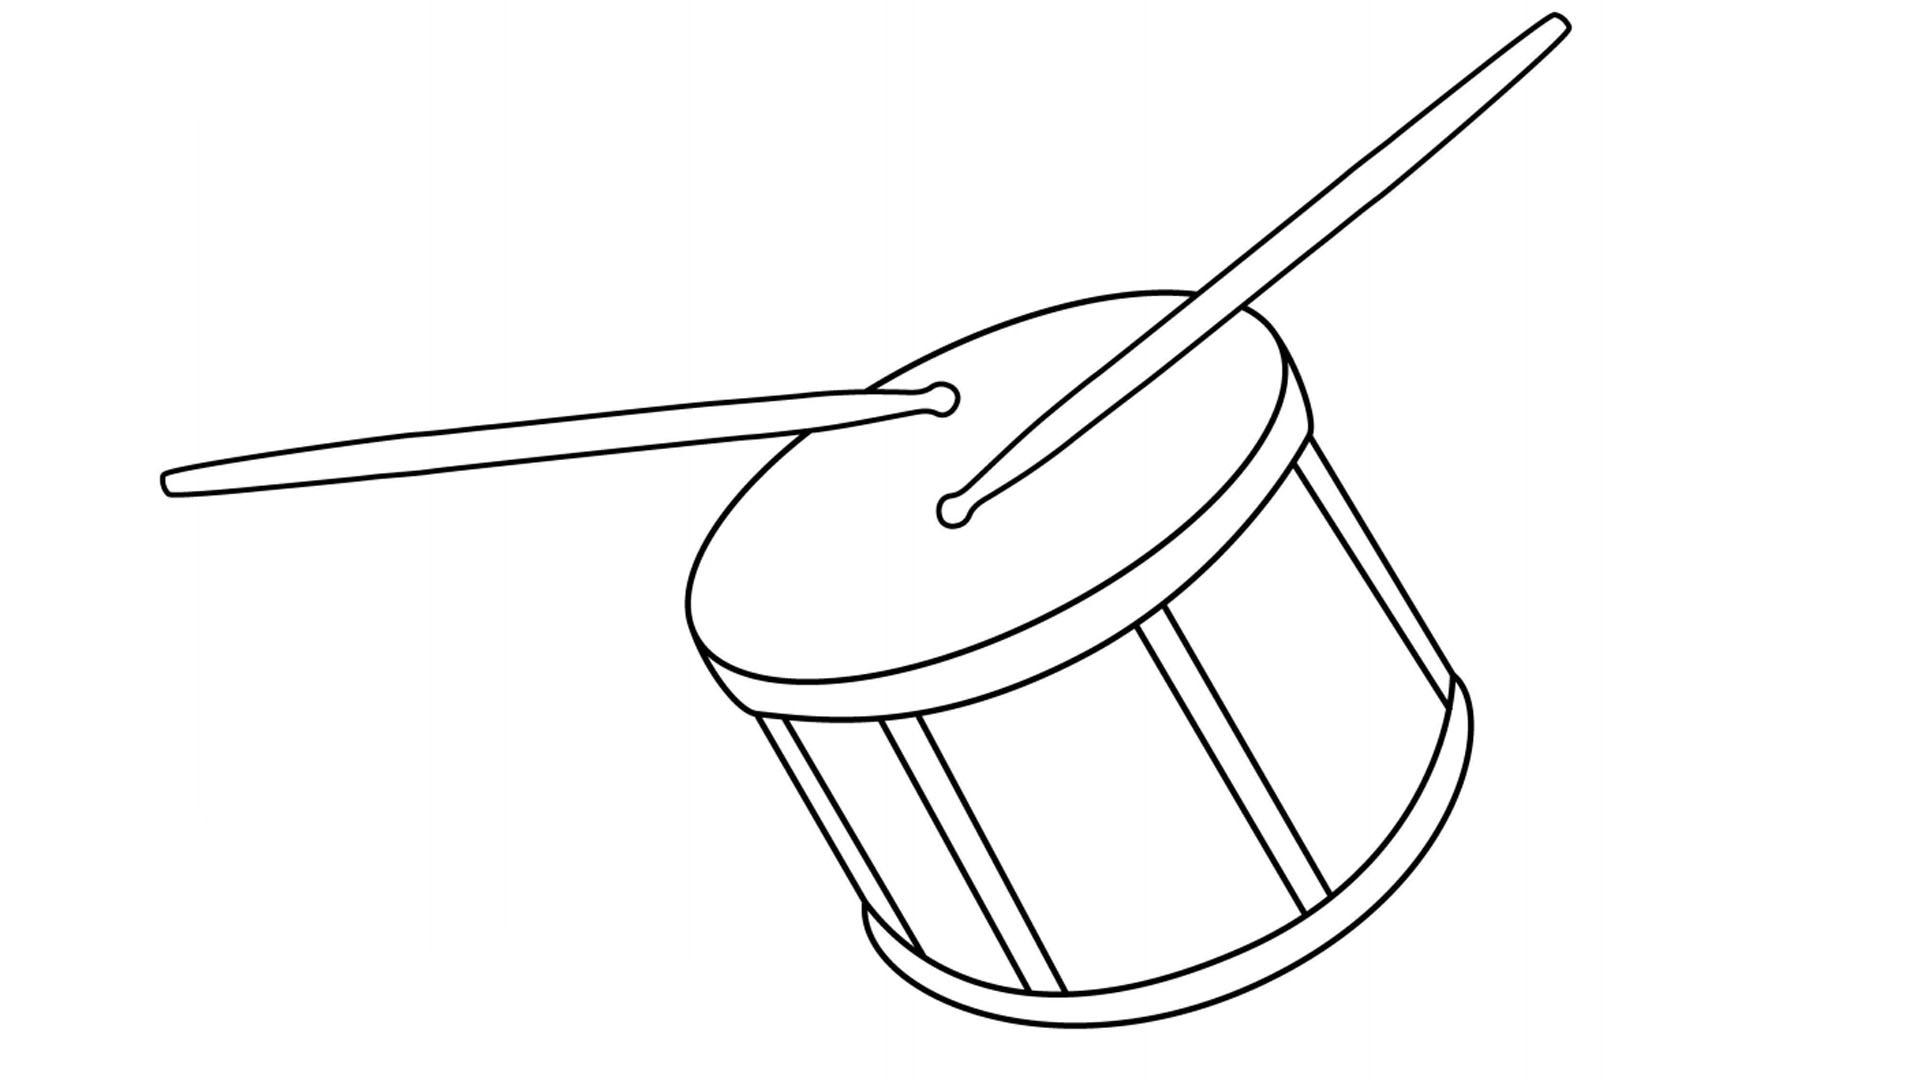 Apennoten - Snare drum